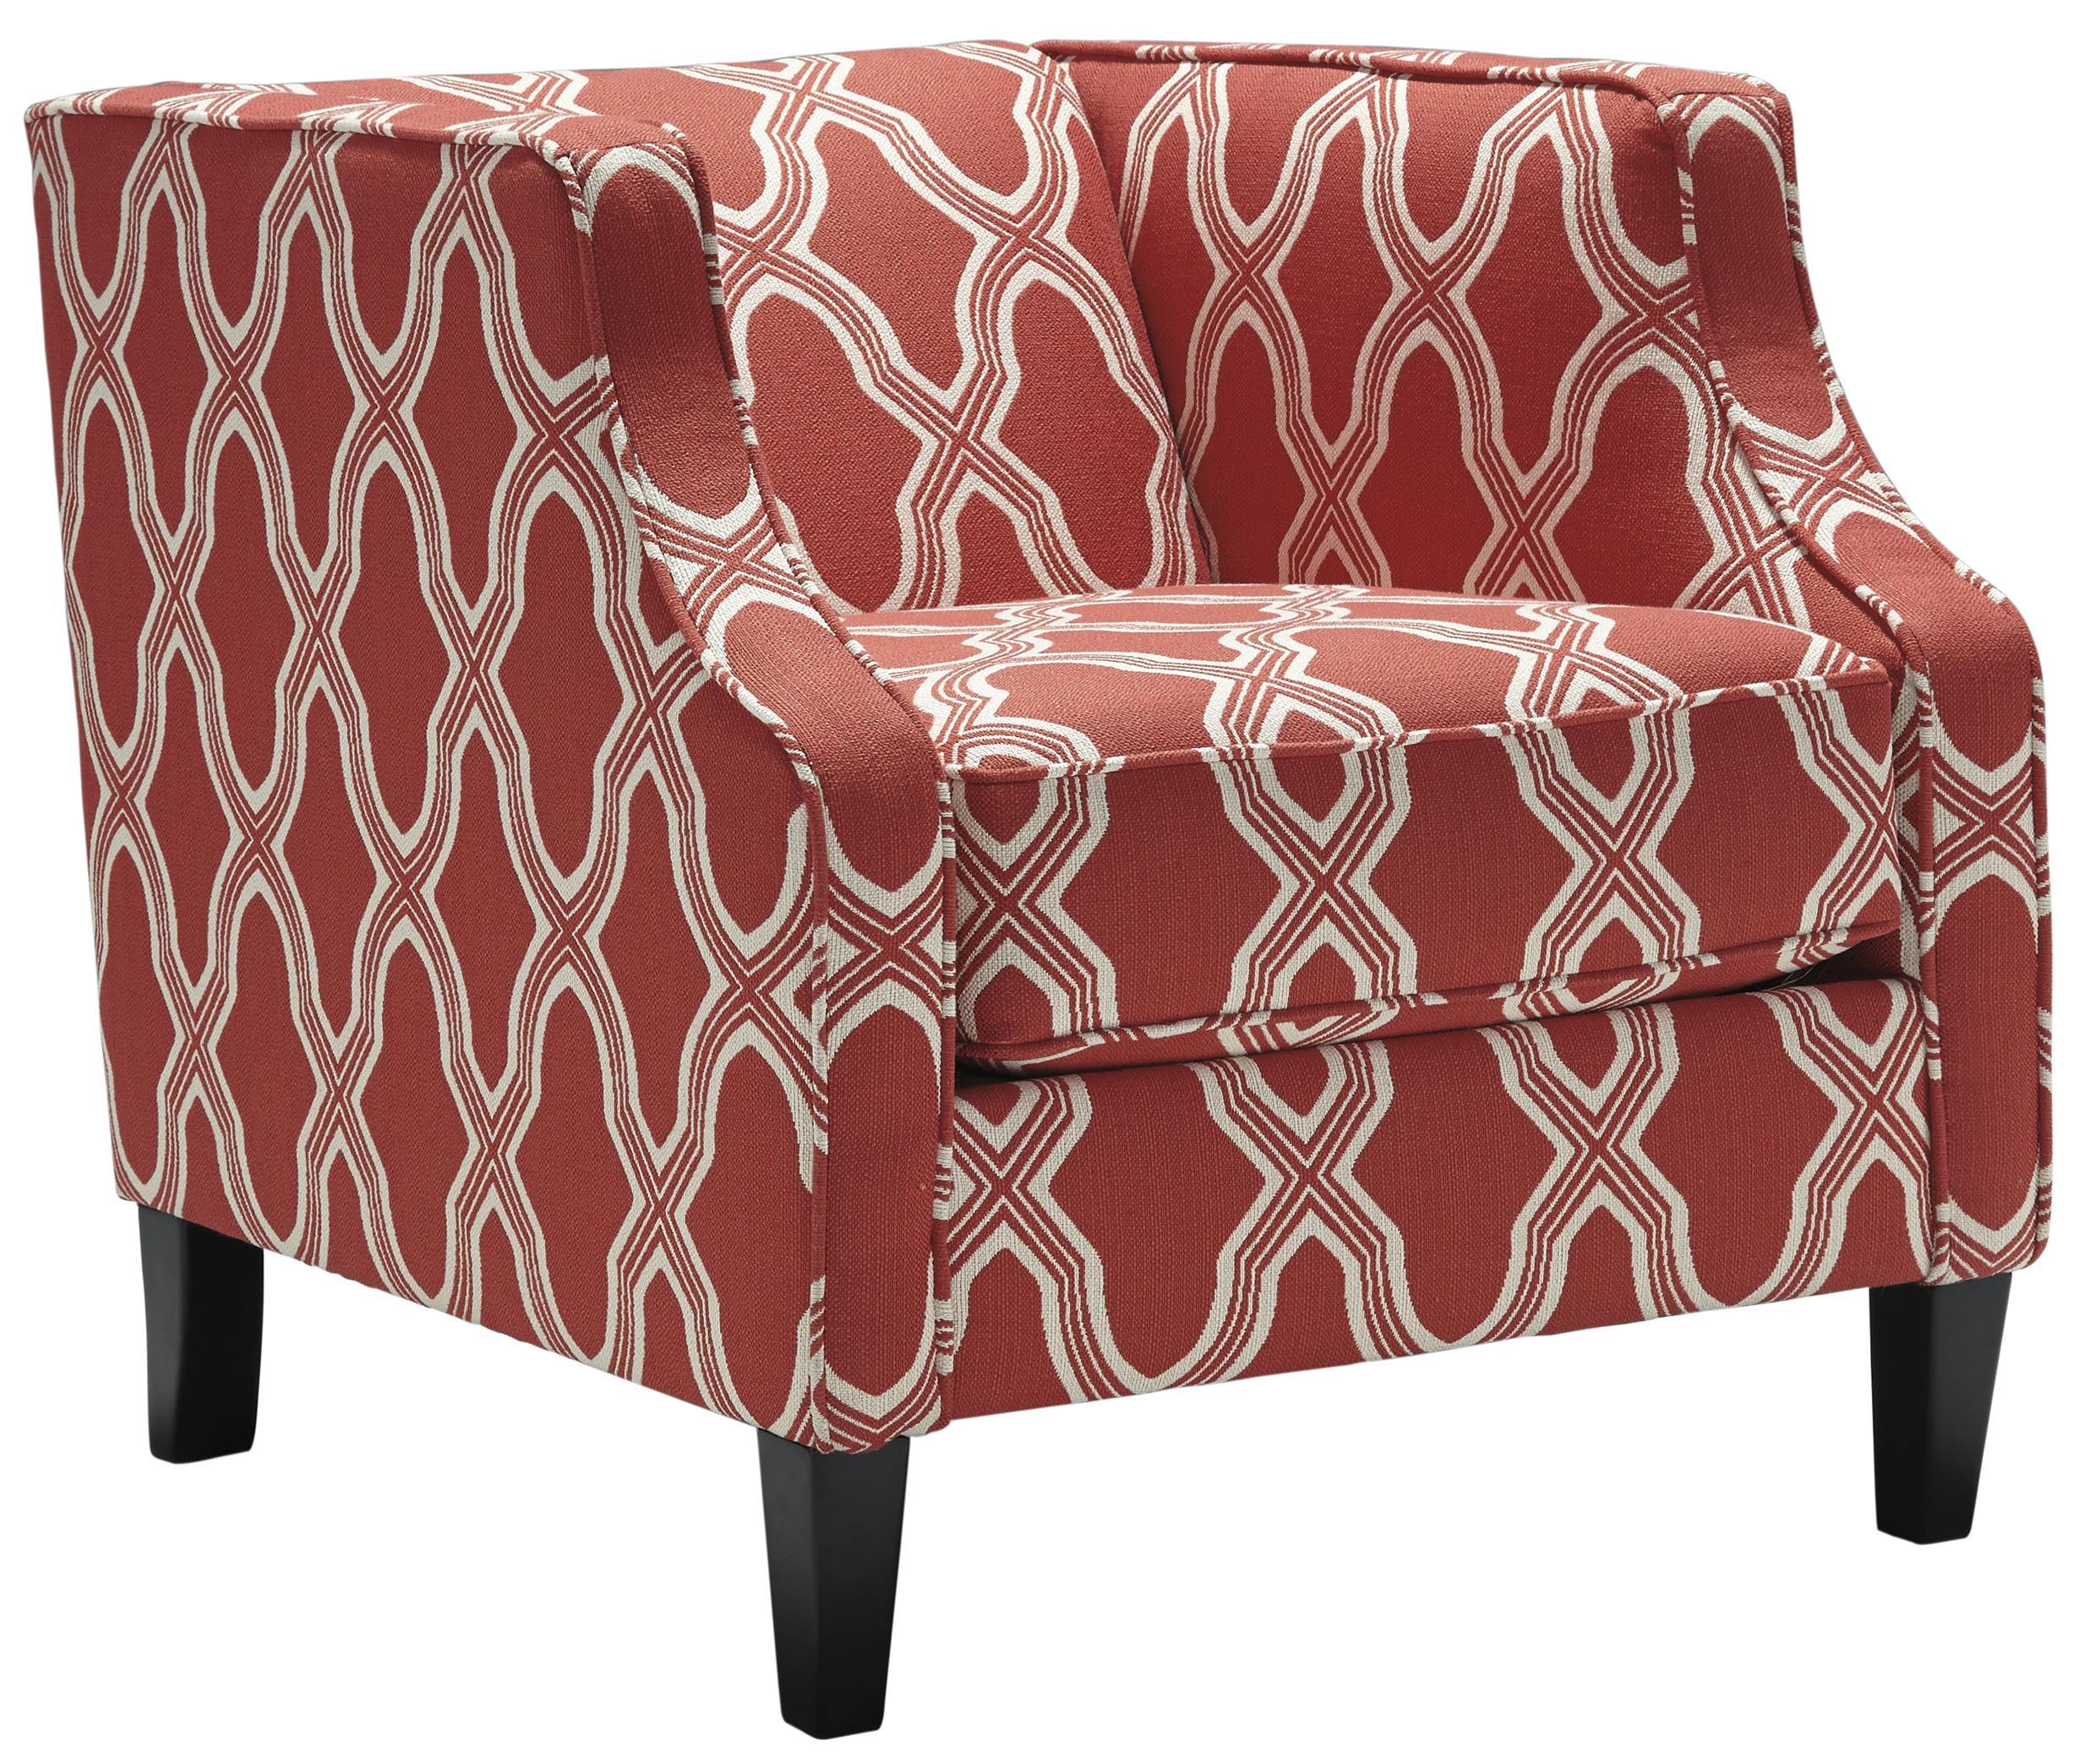 Benchcraft Sansimeon Accent Chair - Item Number: 7990422